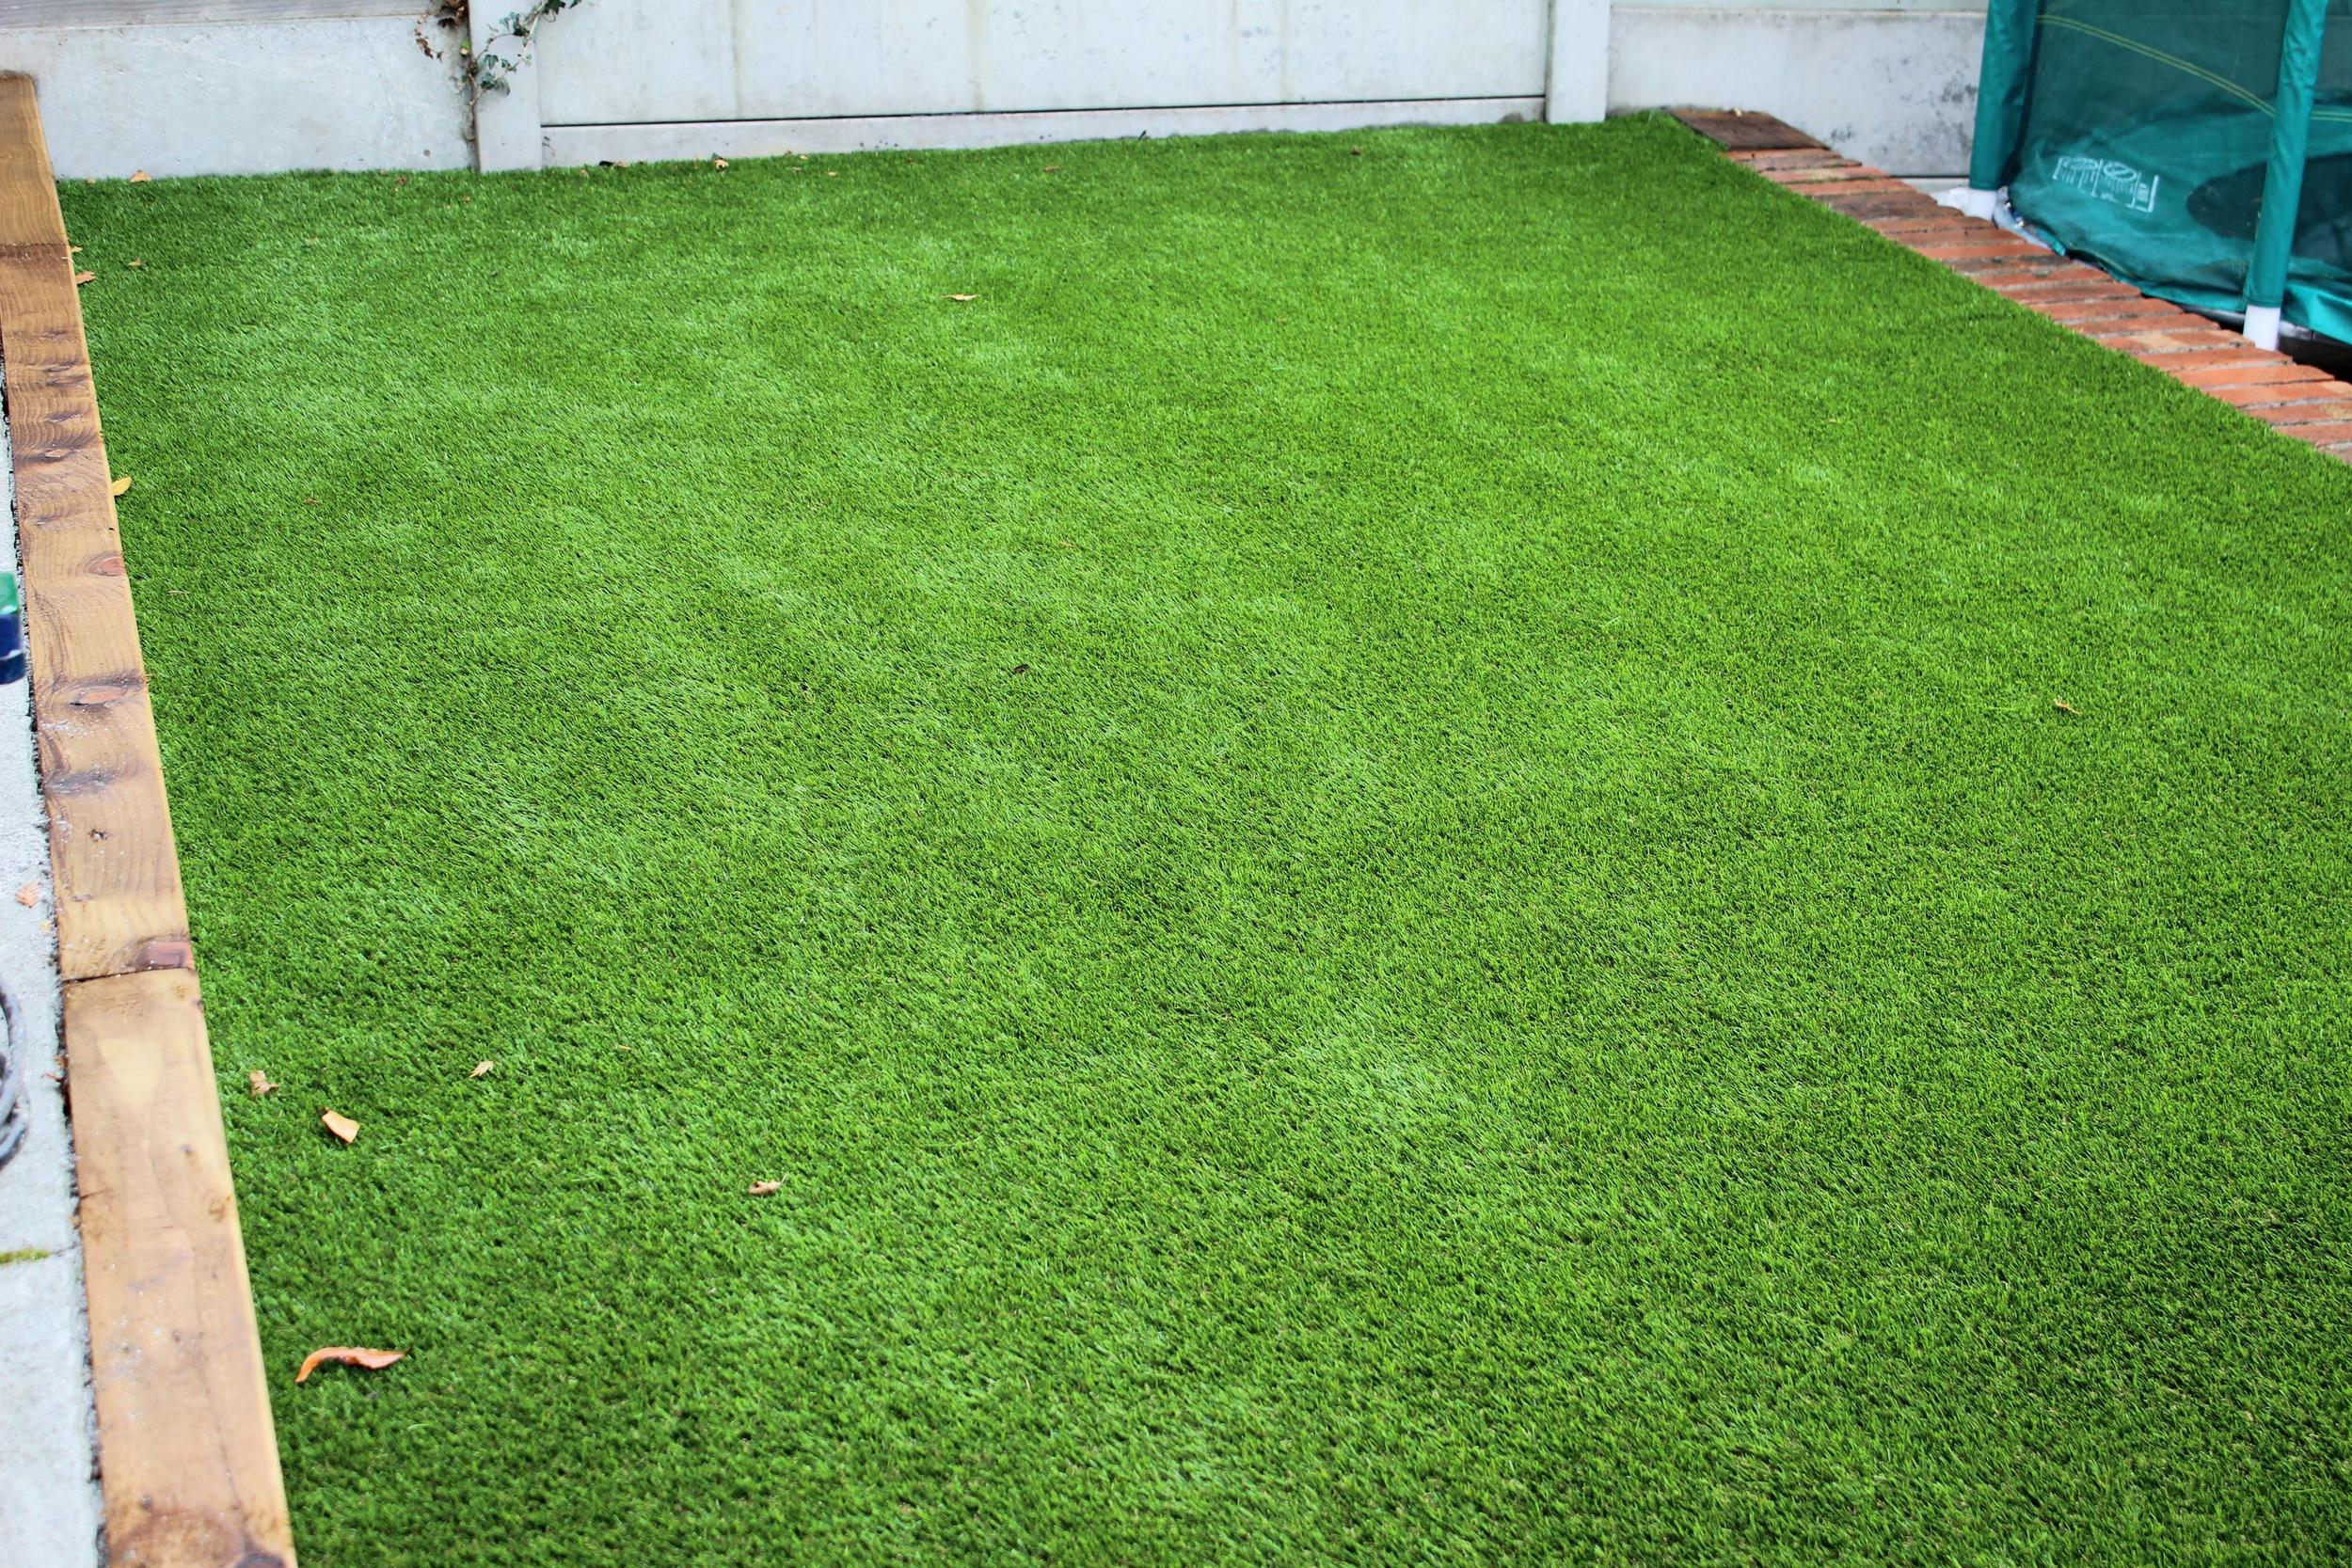 new astroturf lawn